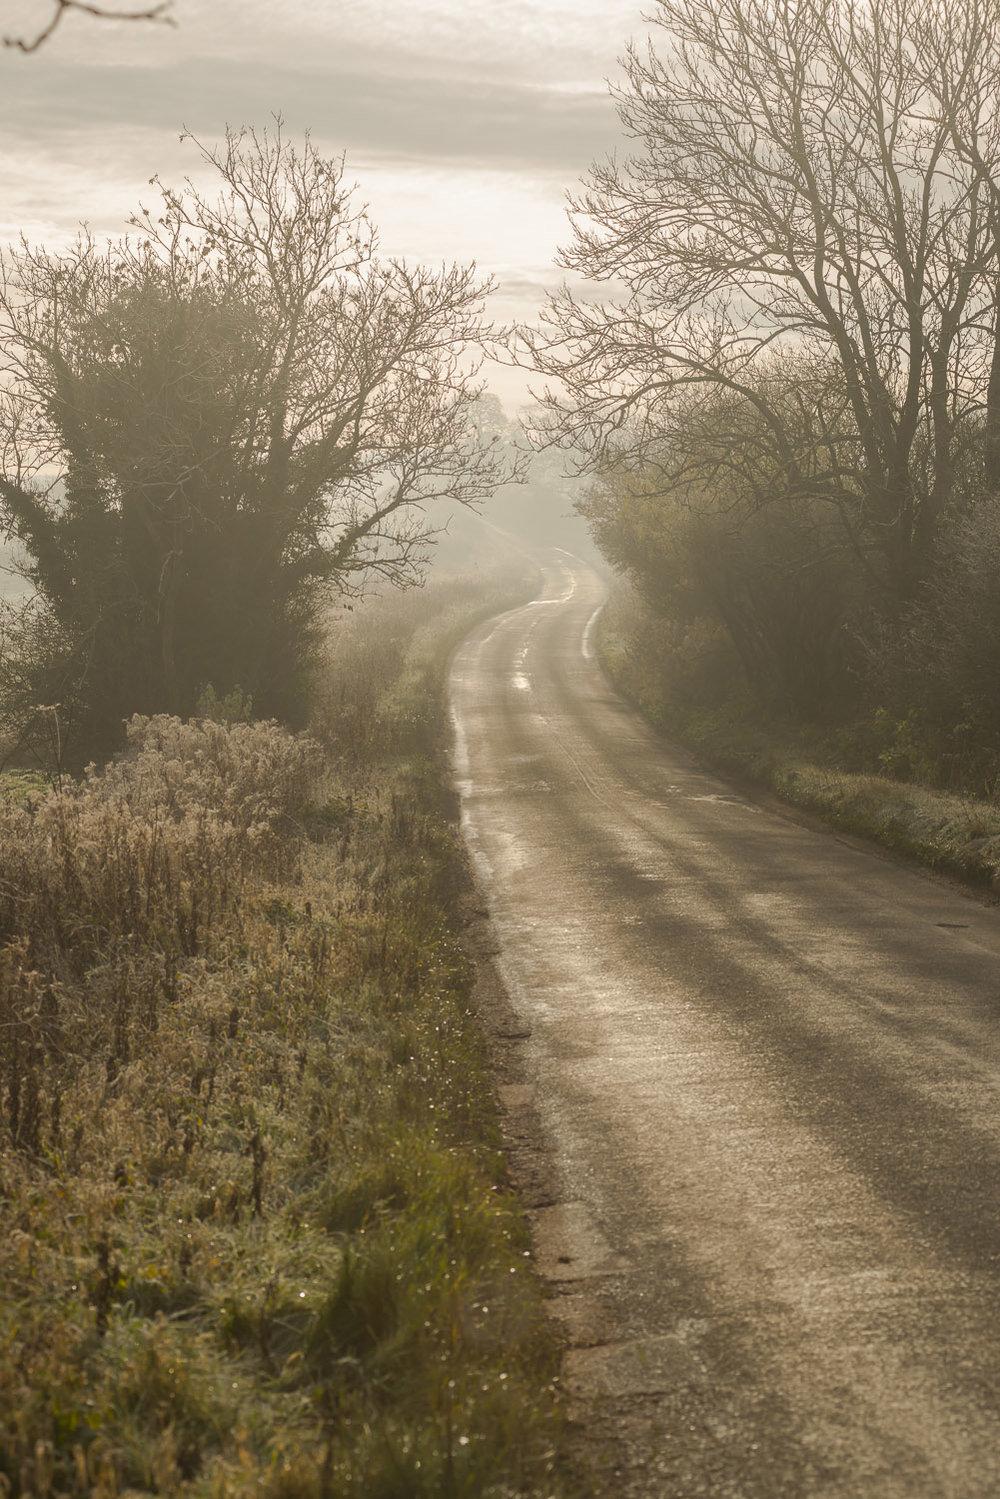 winter-trees-Gloucestershire-Jo-Kearney-photos-landscape-photography-video-landscapes.jpg